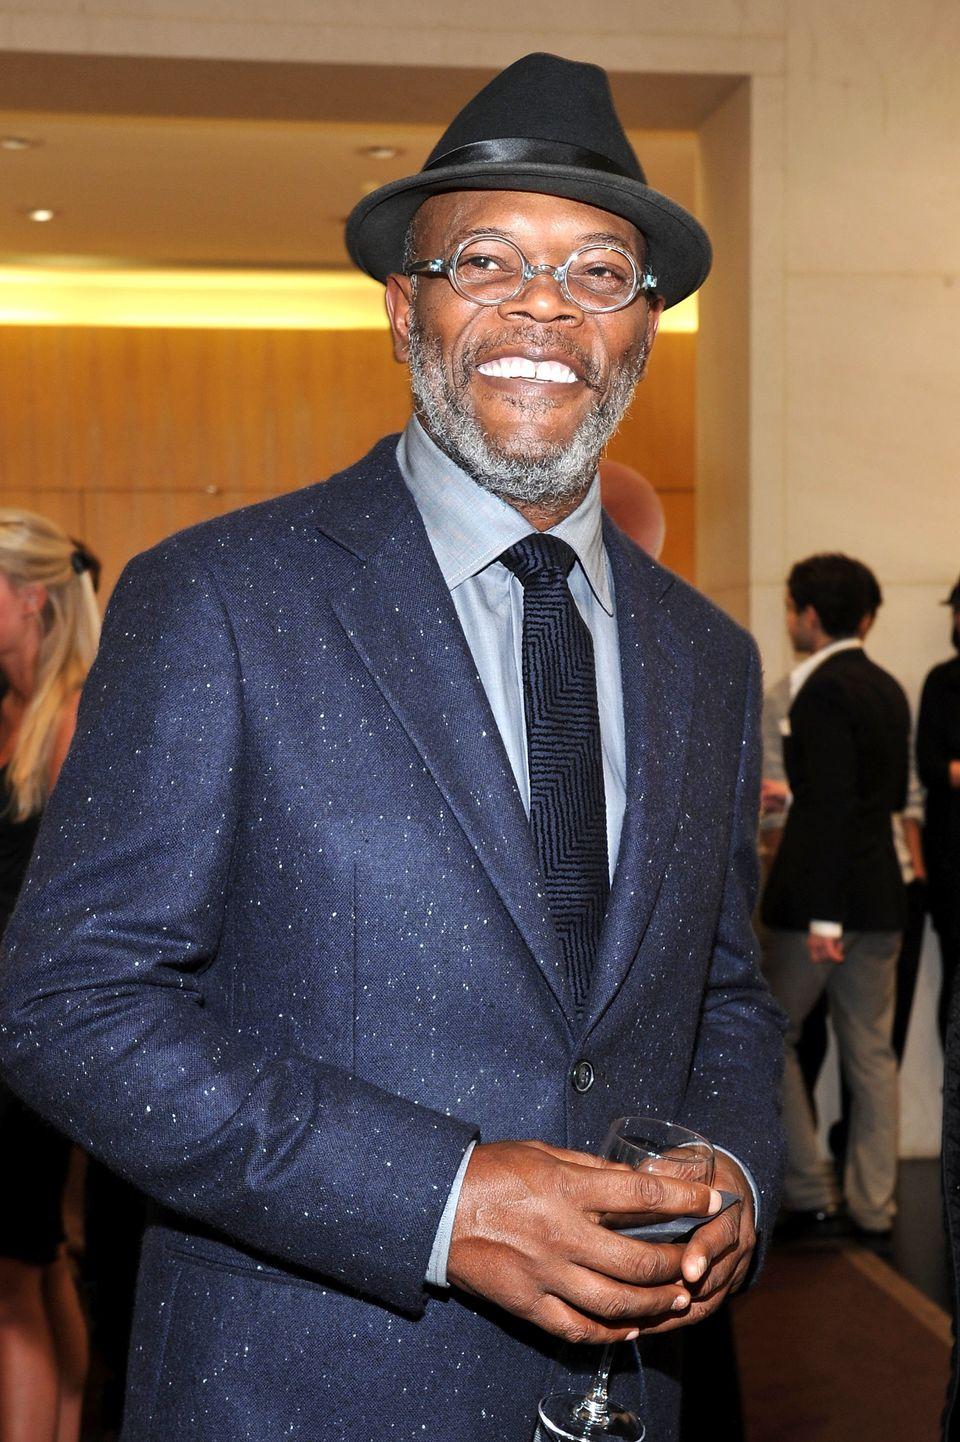 NEW YORK, NY - SEPTEMBER 08:  Actor Samuel L. Jackson attends the Giorgio Armani Madison Avenue event at Giorgio Armani Madis